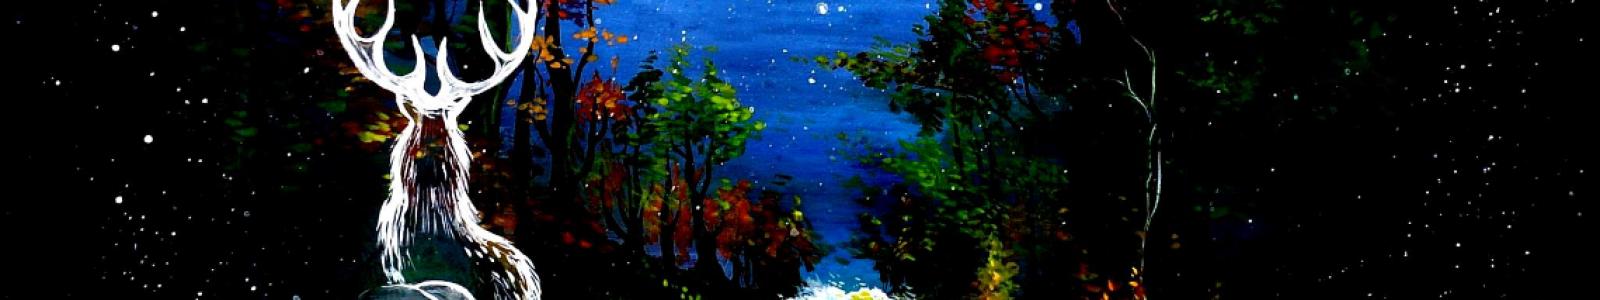 Gallery Painter Manvel Metoyan